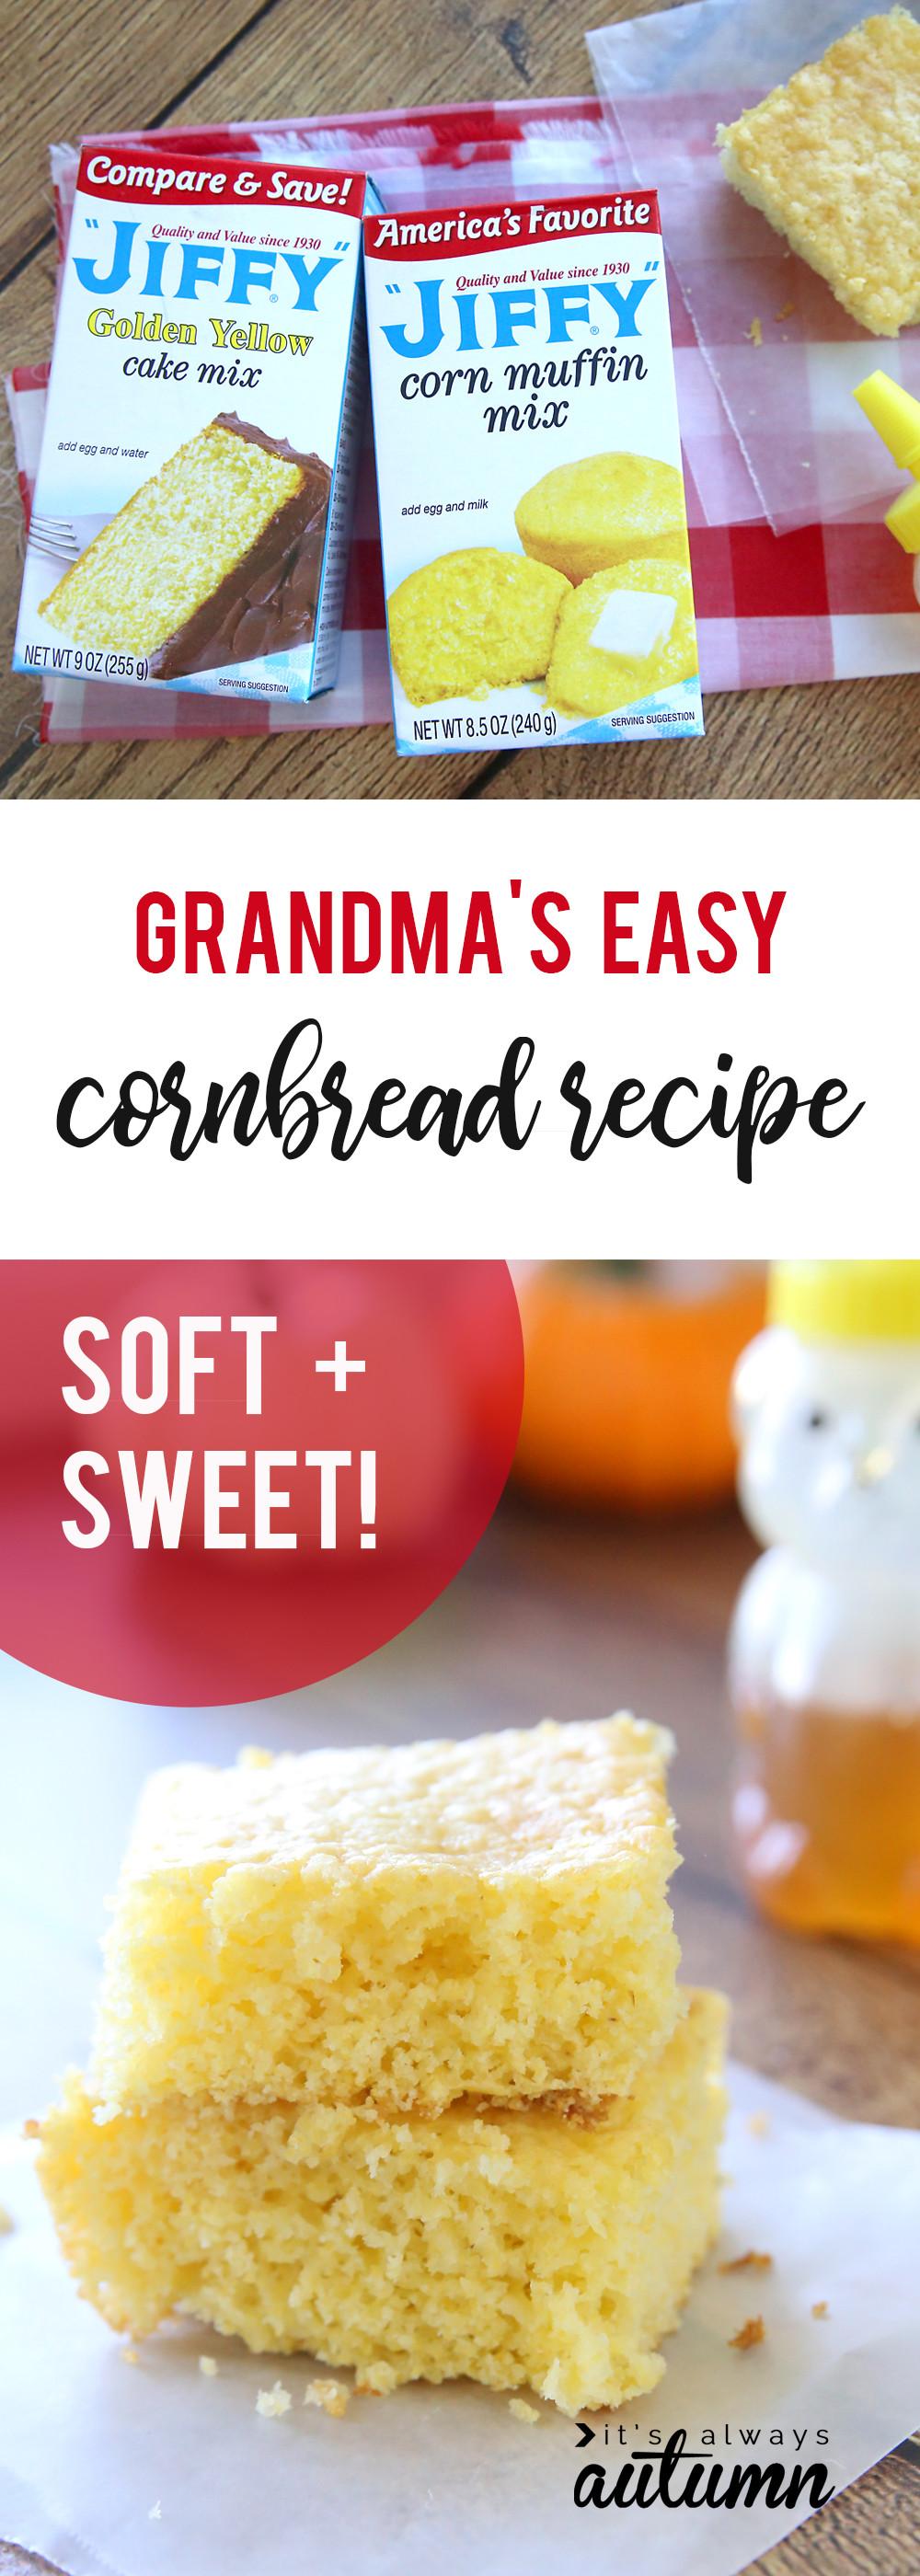 Jiffy Cornbread Mix Recipes  Quick easy sweet Jiffy cornbread recipe everyone will